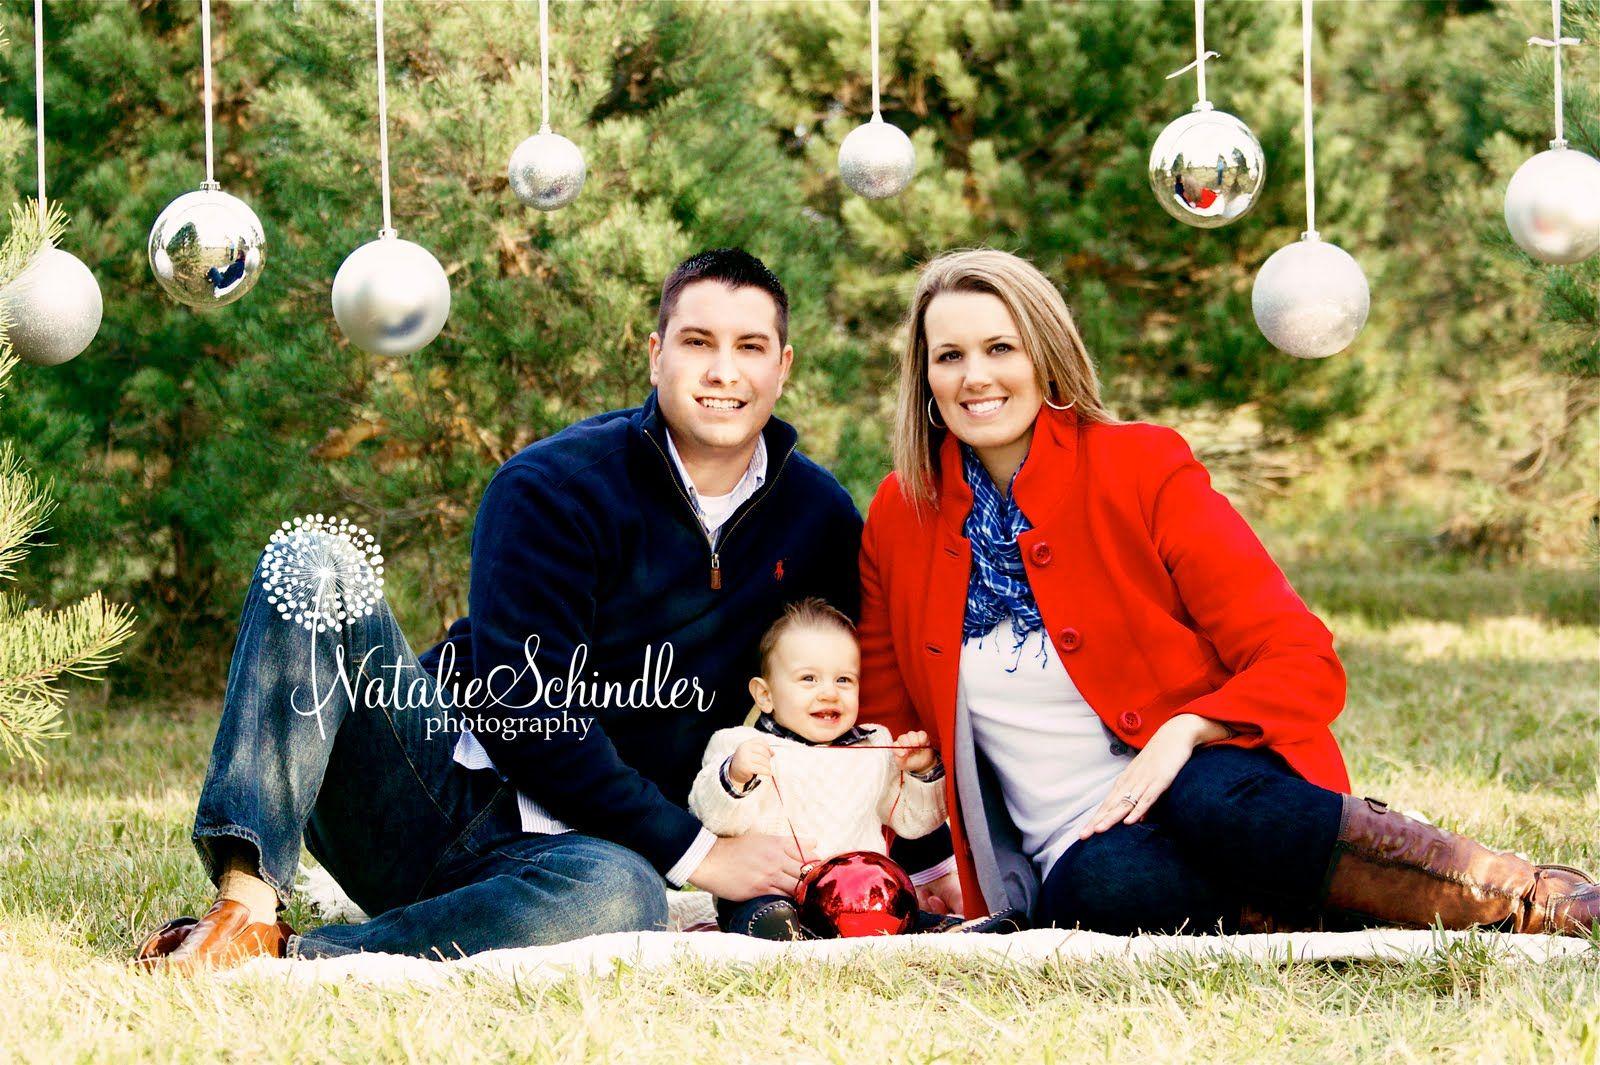 Outdoor Christmas Photo Shoot Ideas Natalie Schindl...